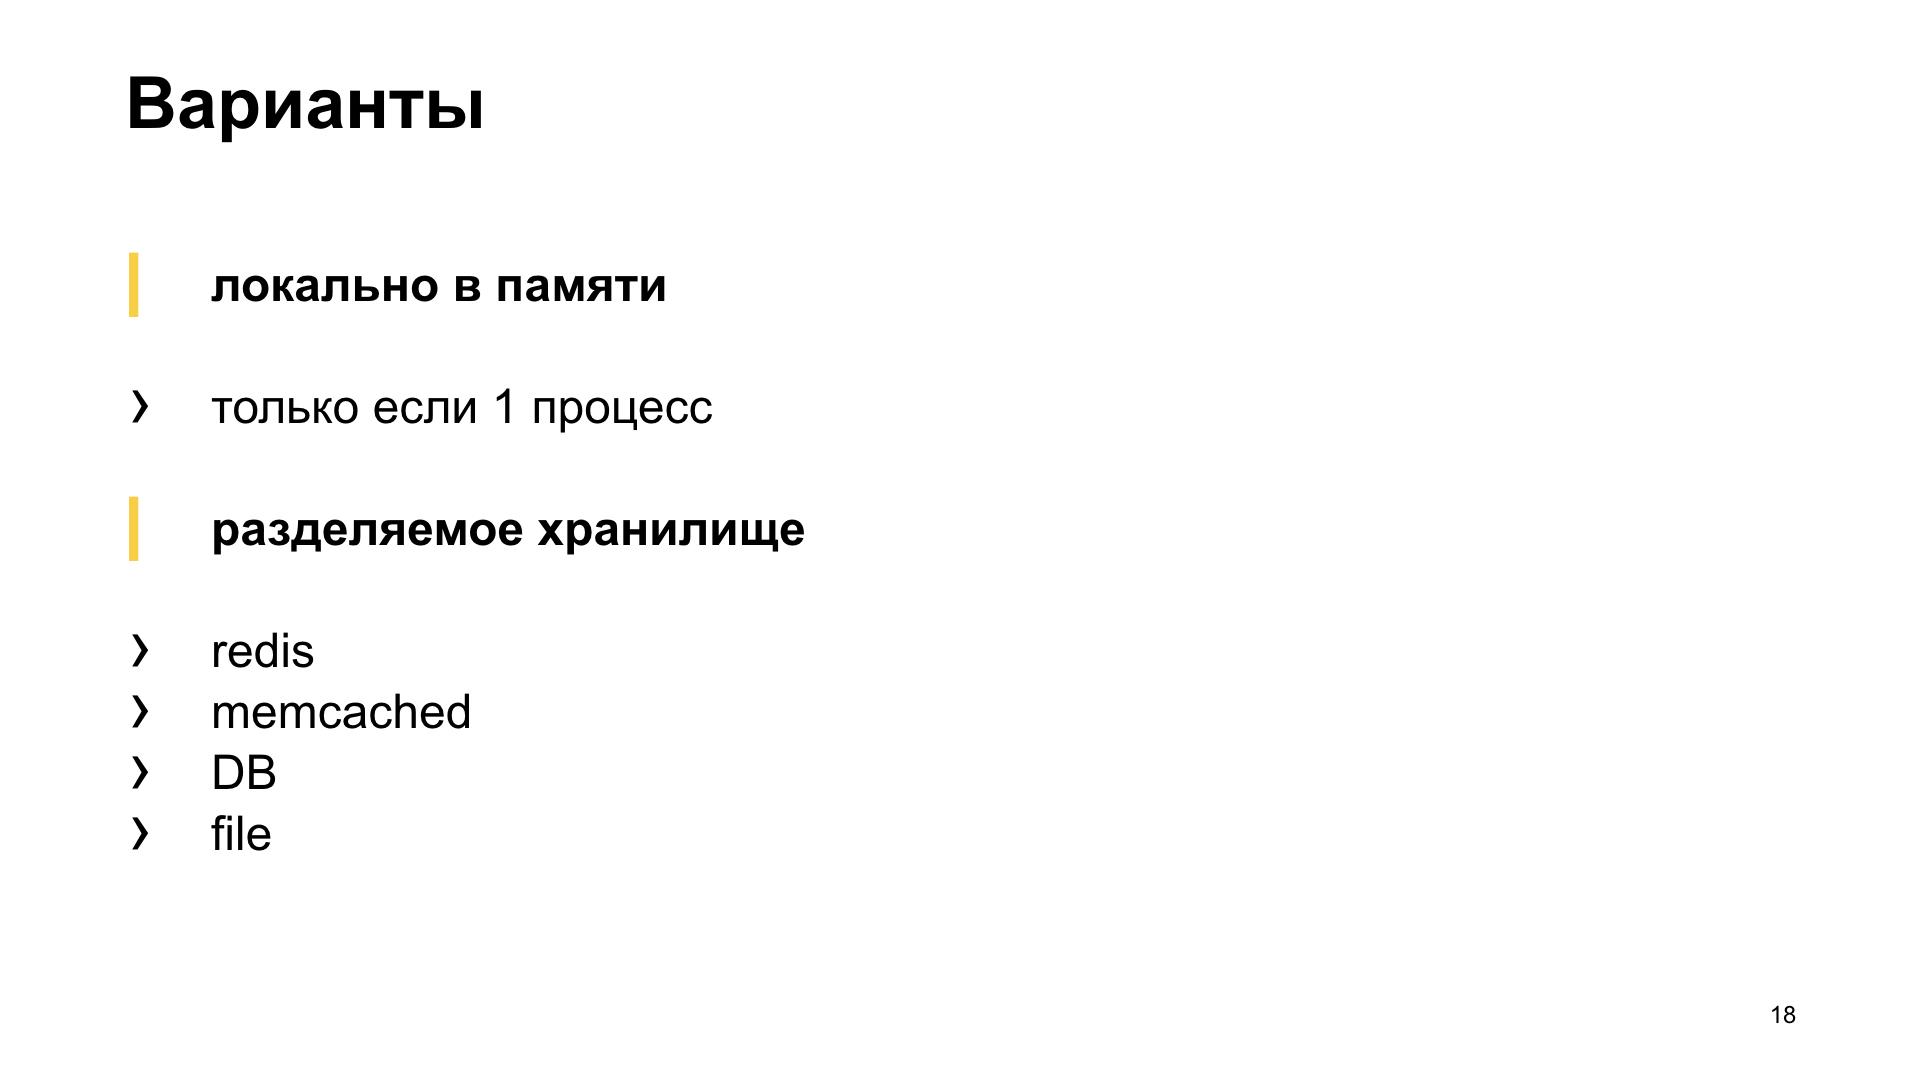 uWSGI в помощь метрикам. Доклад Яндекса - 11